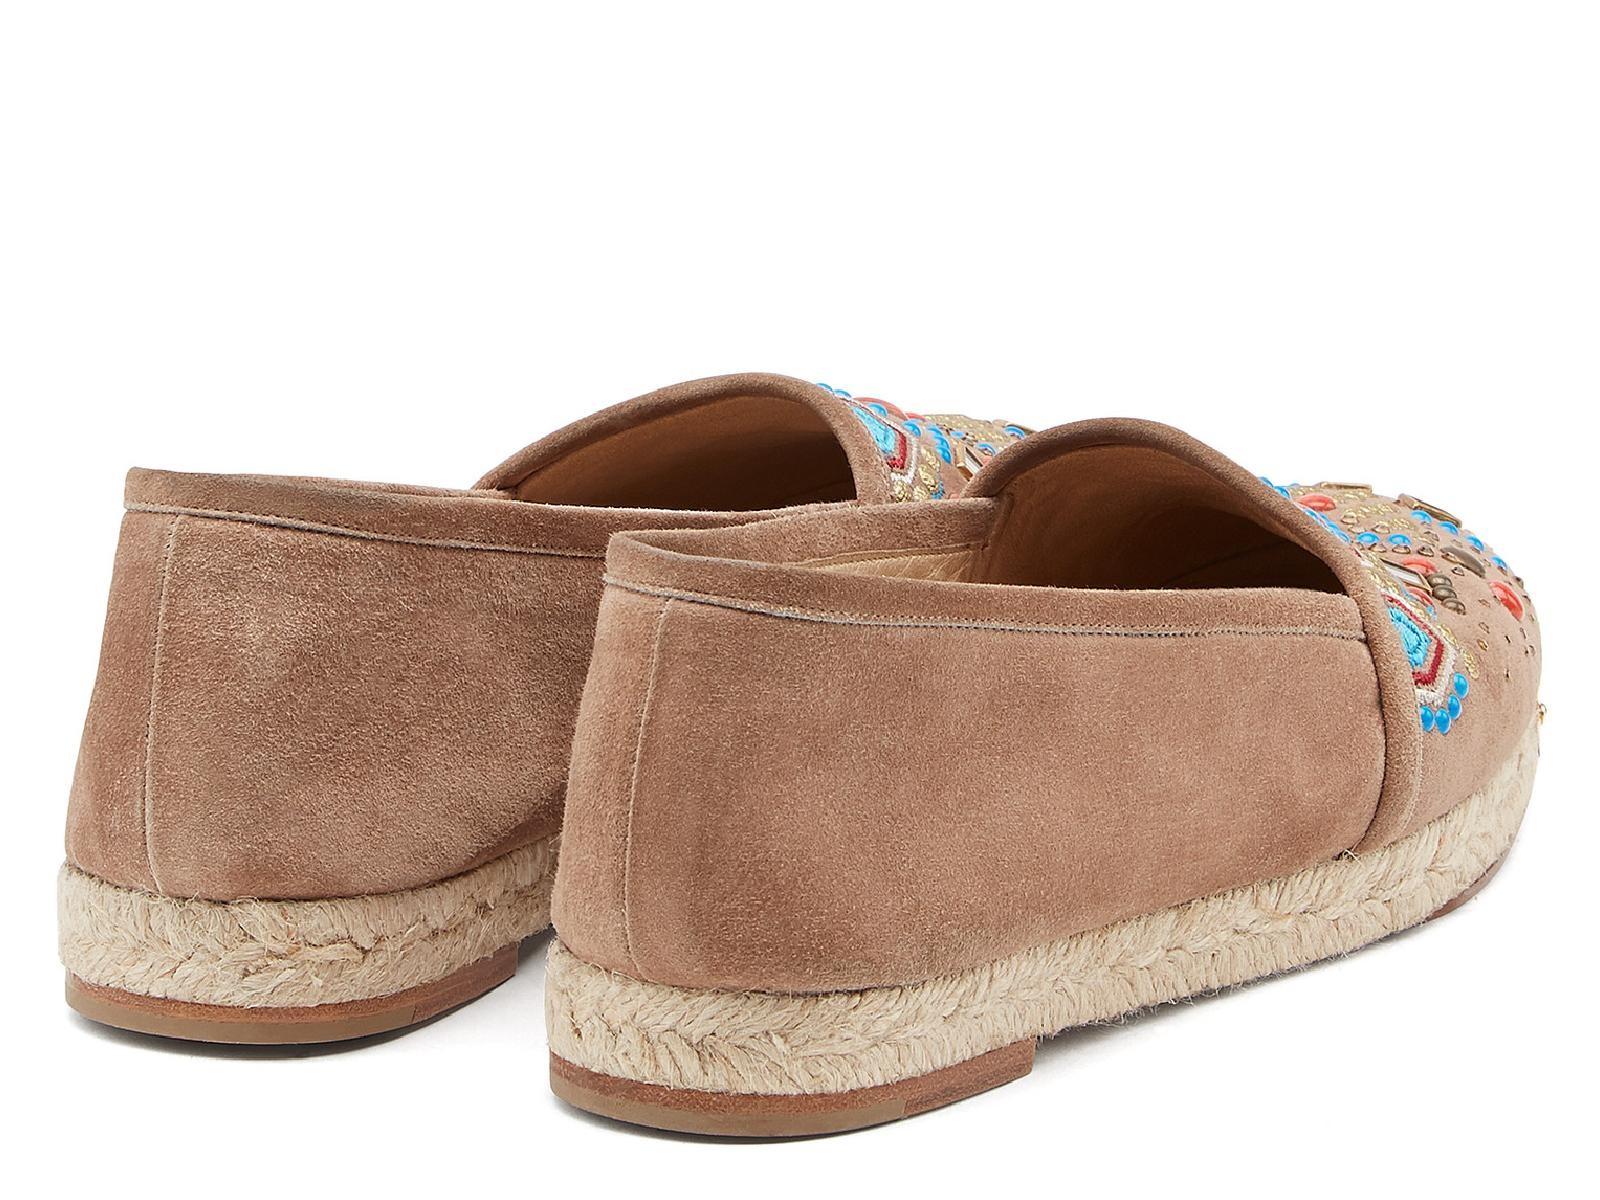 Giuseppe Zanotti women espadrilles flat shoes in Light Brown Chamois Chamois Chamois leather a9ae5e